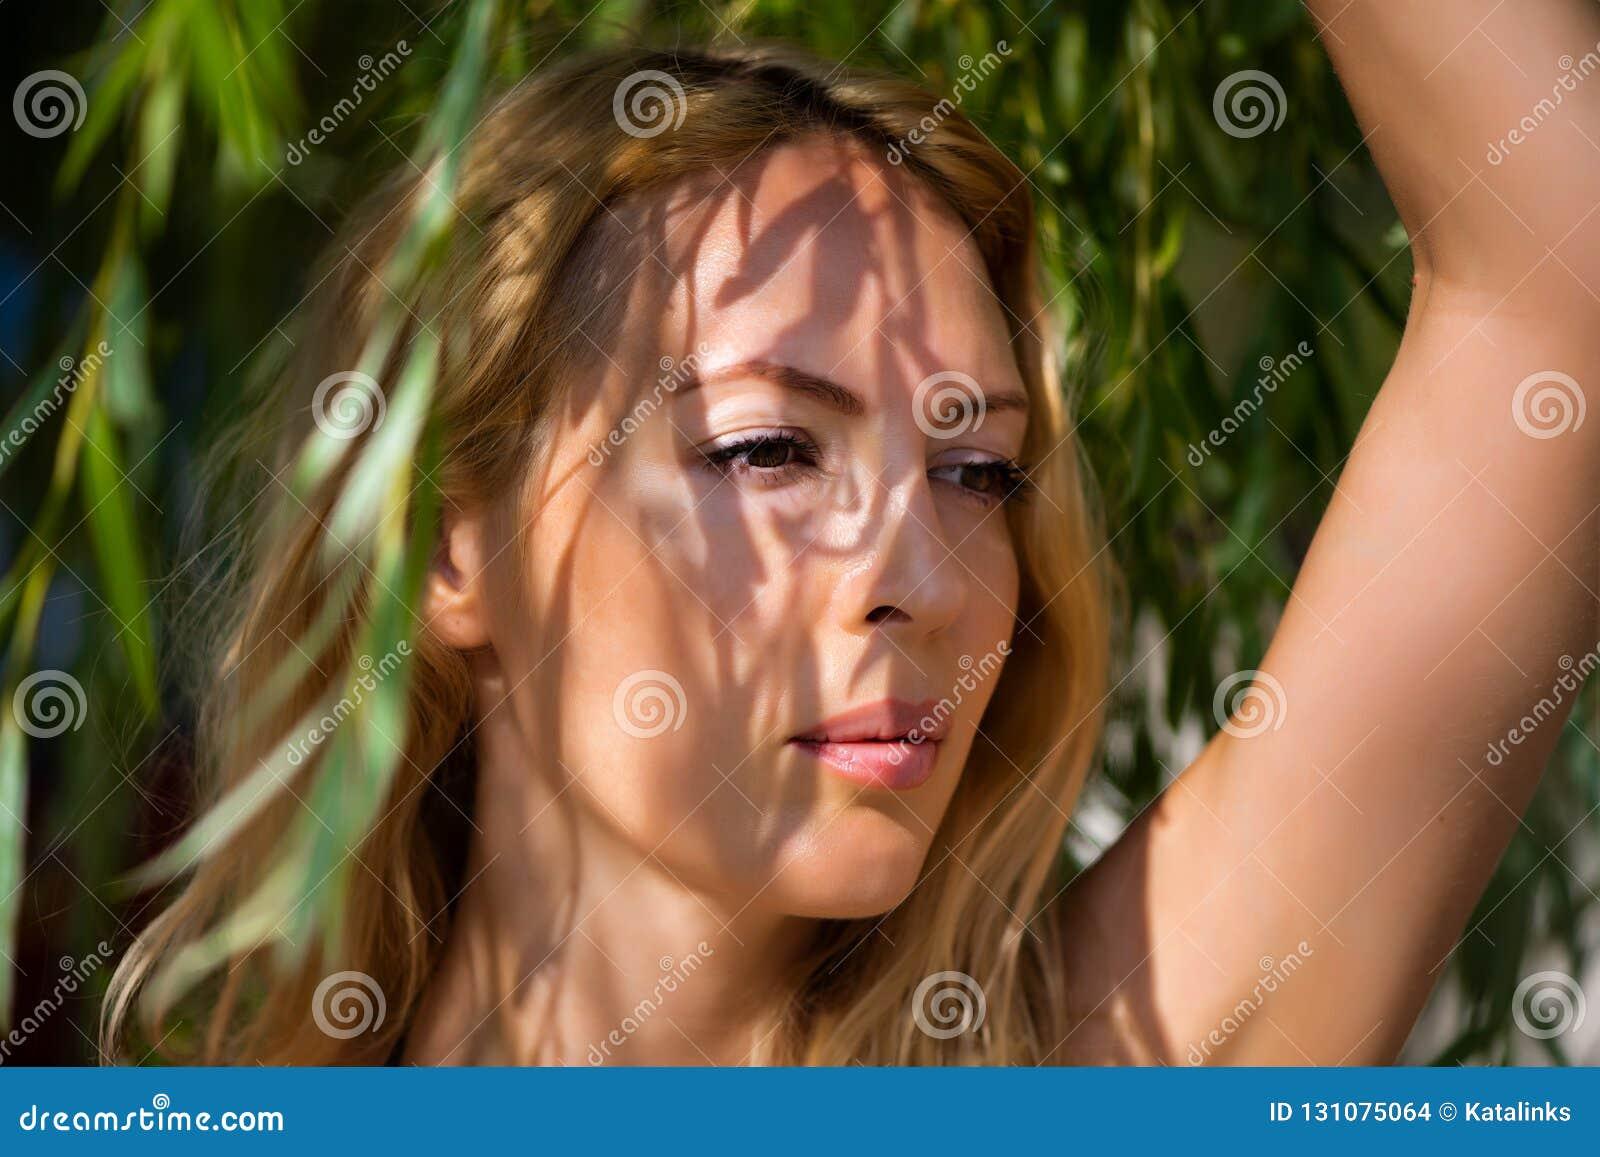 Macro portrait of young beautiful blond woman